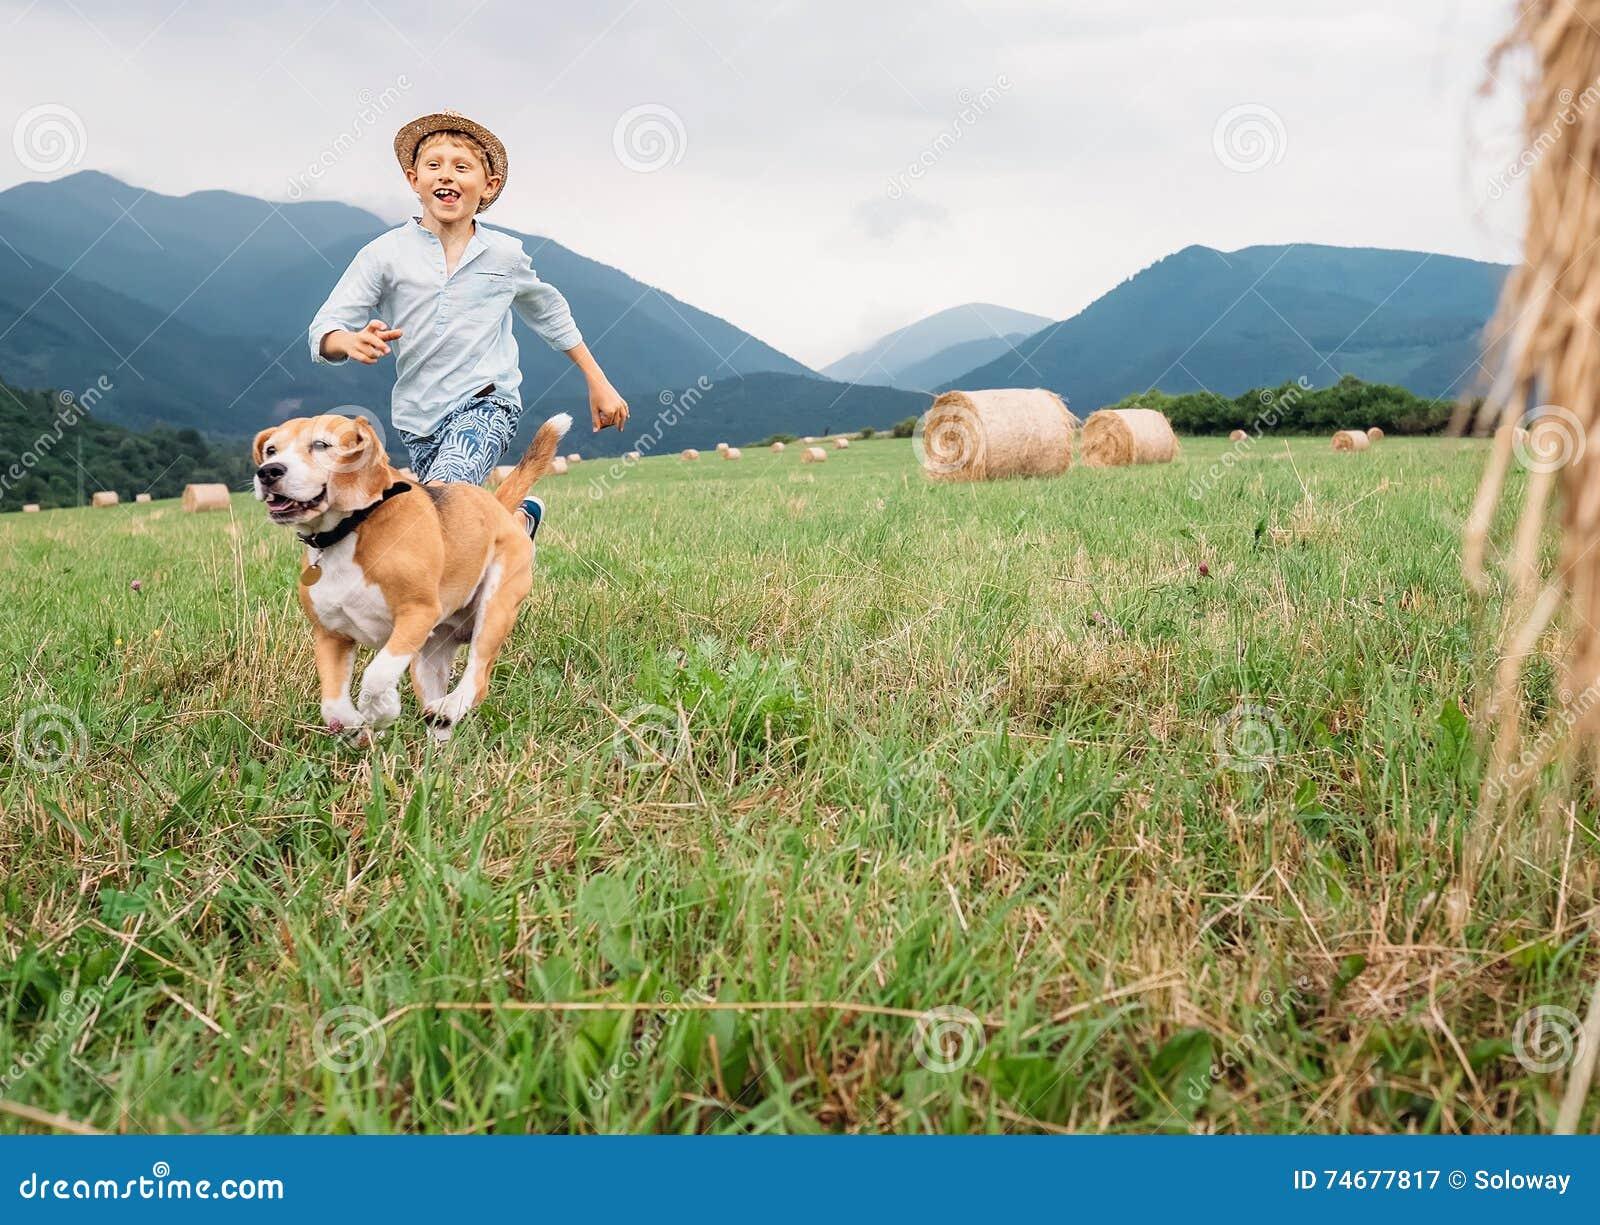 boy-dog-run-together-field-haystacks-746